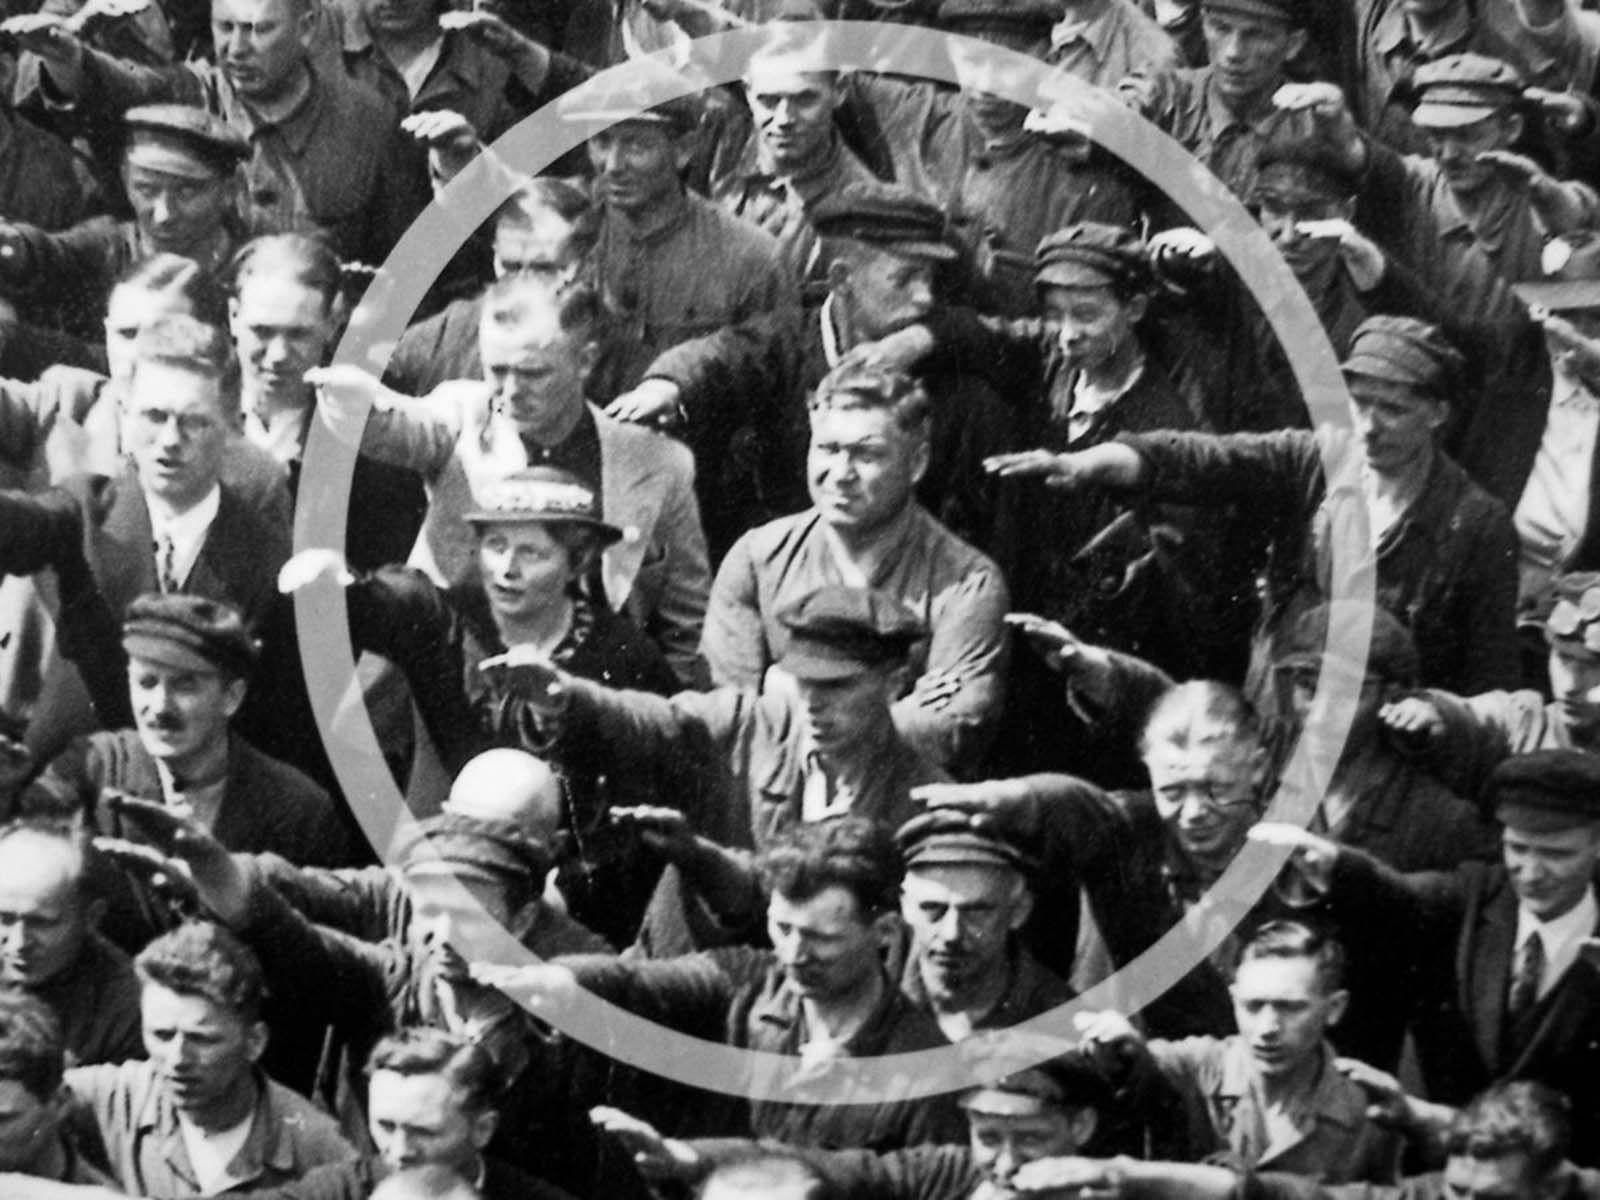 august_landmesser_2.jpg